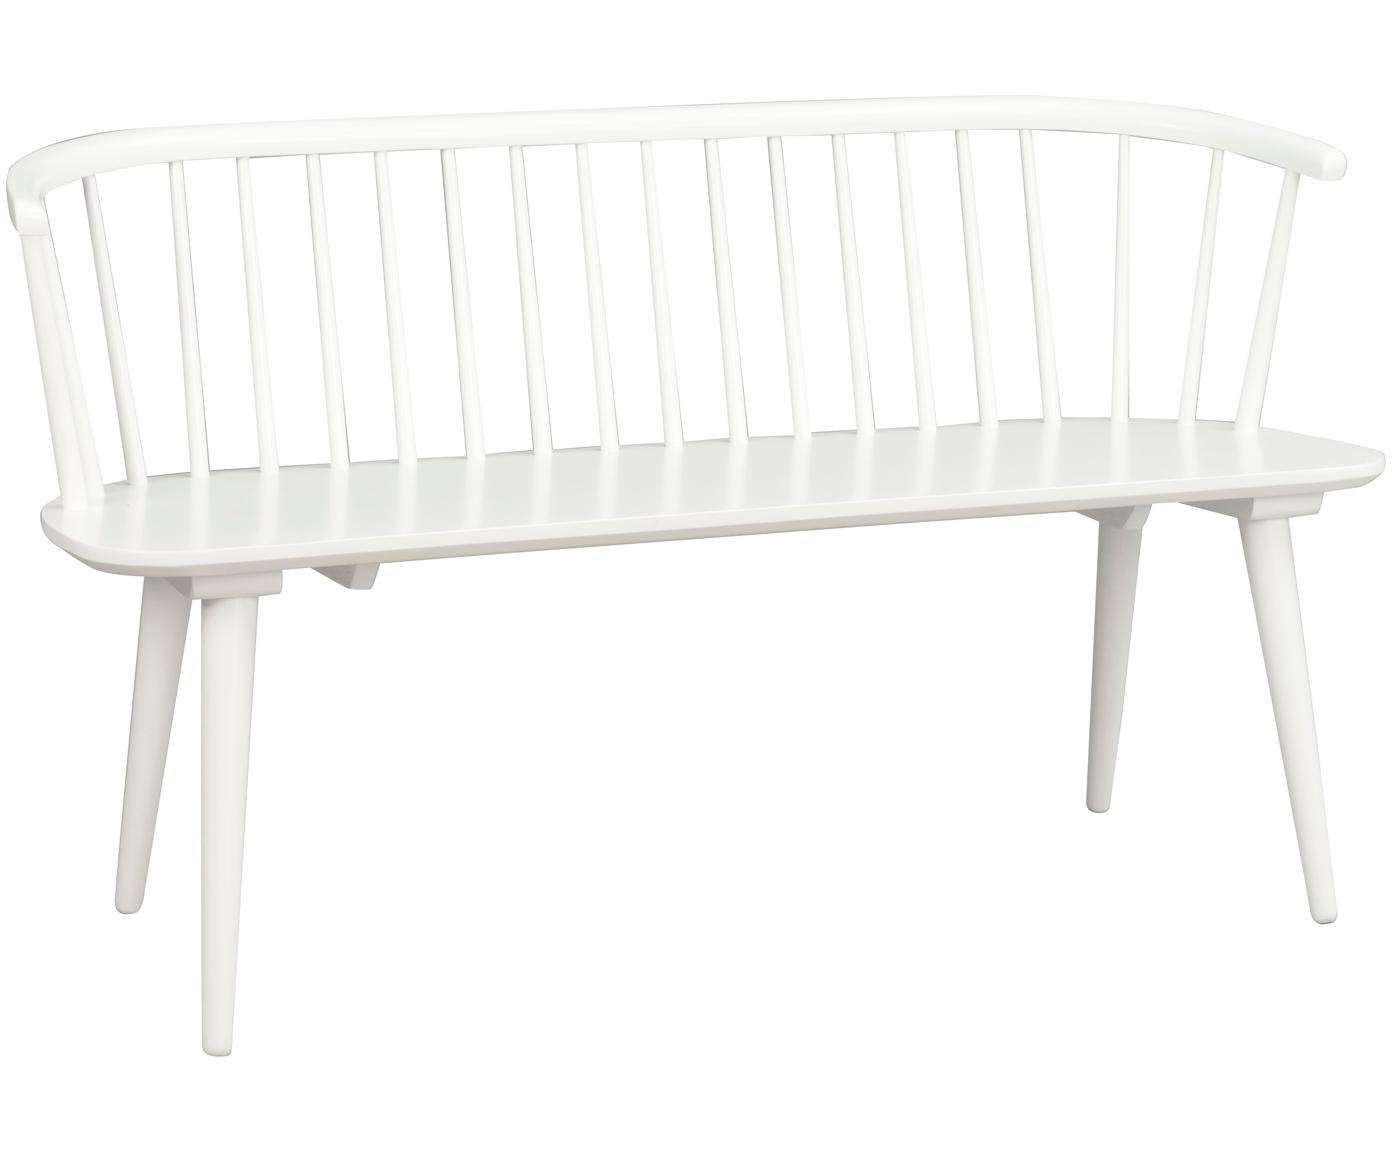 Banco de madera maciza de diseño Windsor Carmen, Madera de caucho maciza, pintado, Blanco, An 134 x Al 76 cm